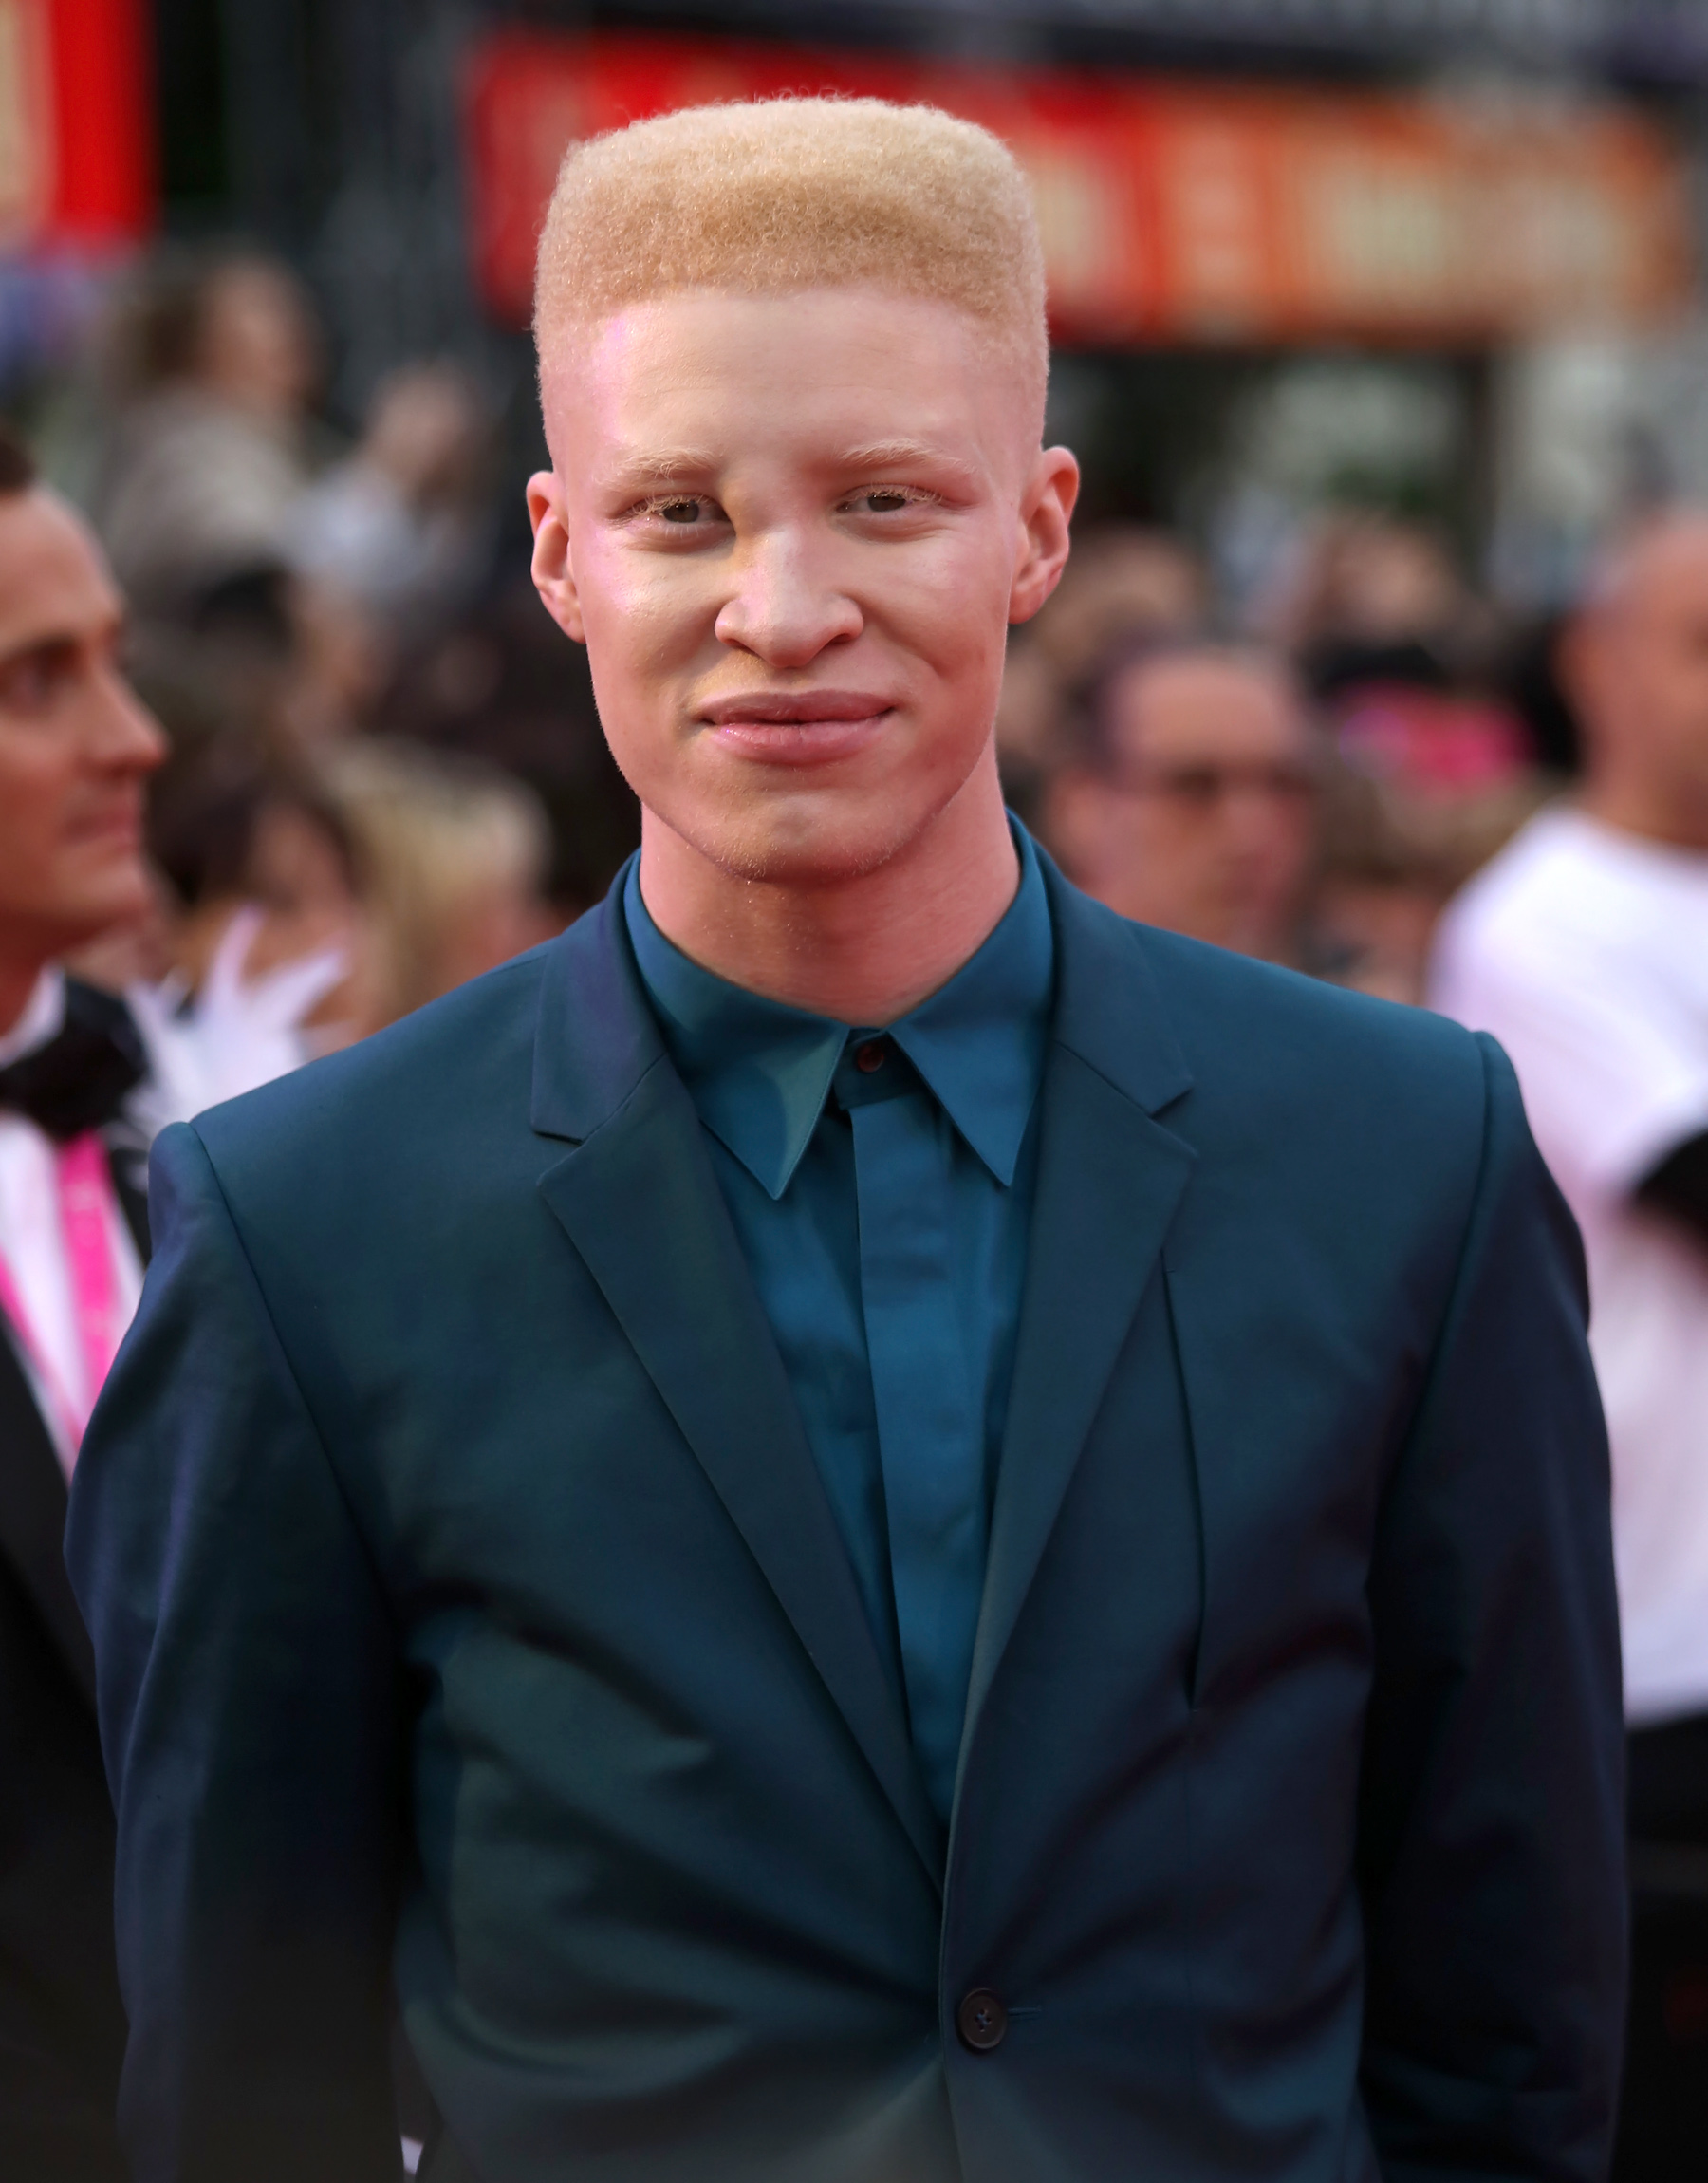 Shaun albino model nose